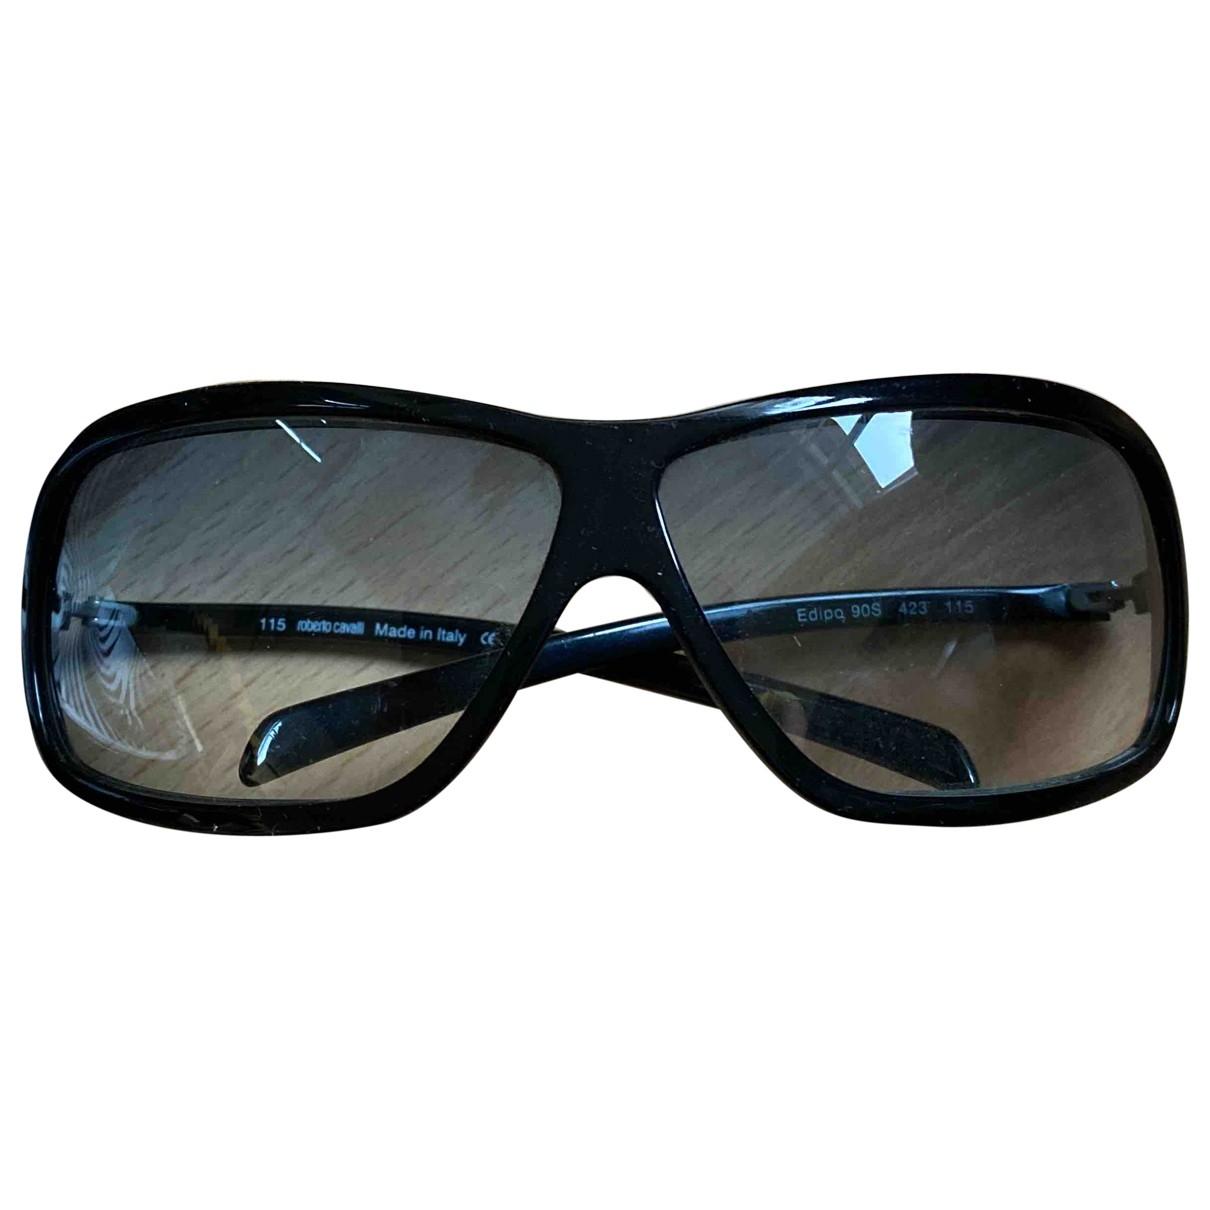 Roberto Cavalli \N Sonnenbrillen in  Schwarz Kunststoff